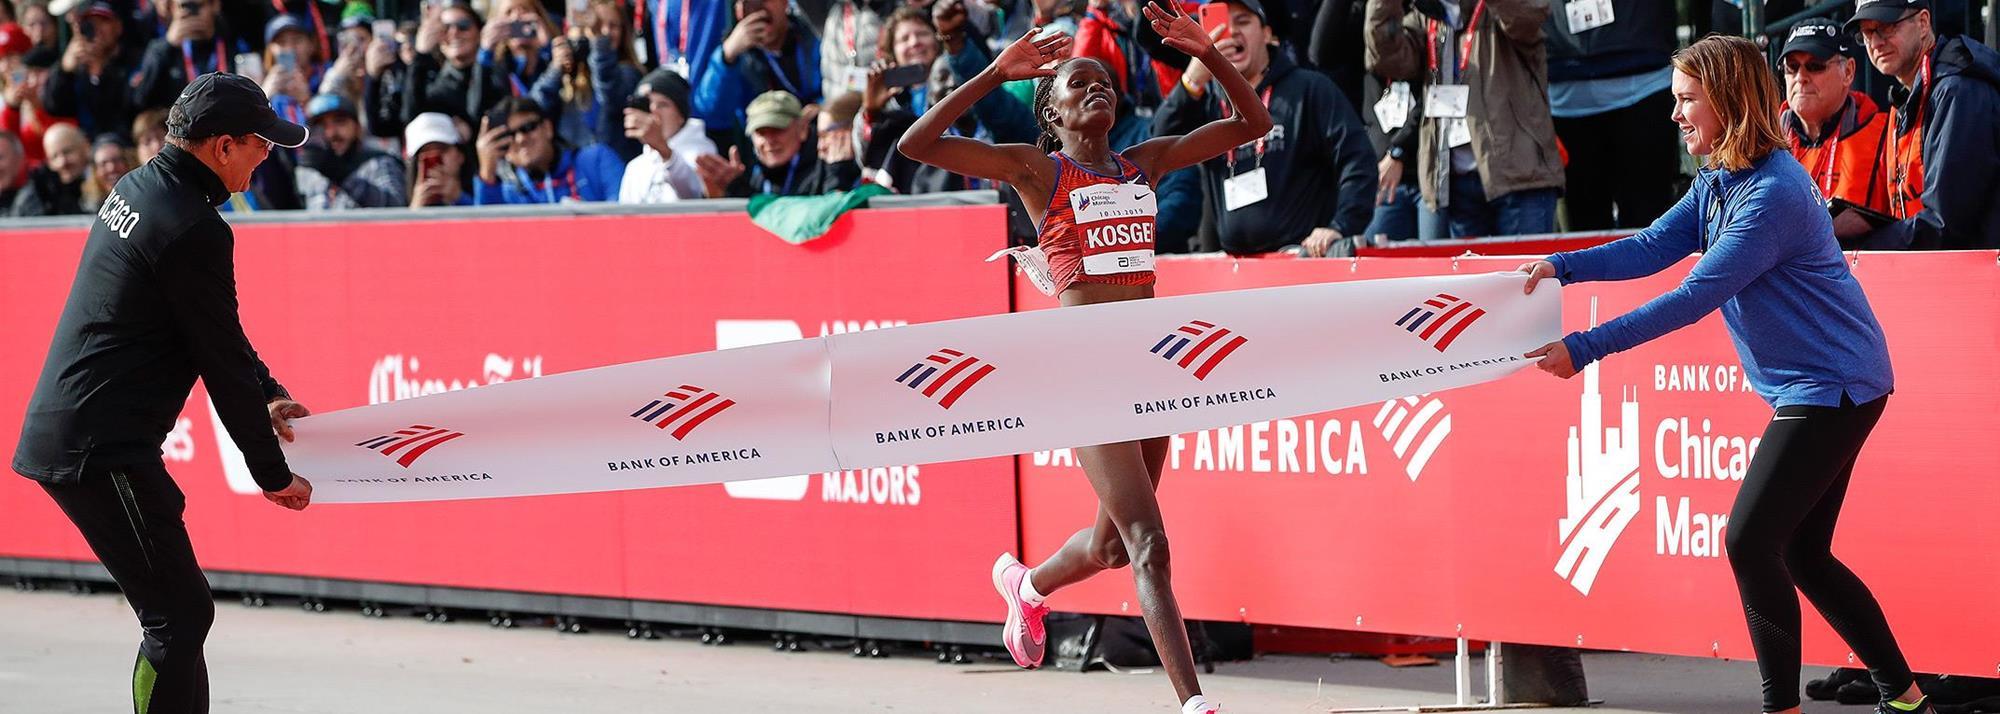 Ratified: Kosgei's 2:14:04 world marathon record, men's 4x400m relay world indoor record